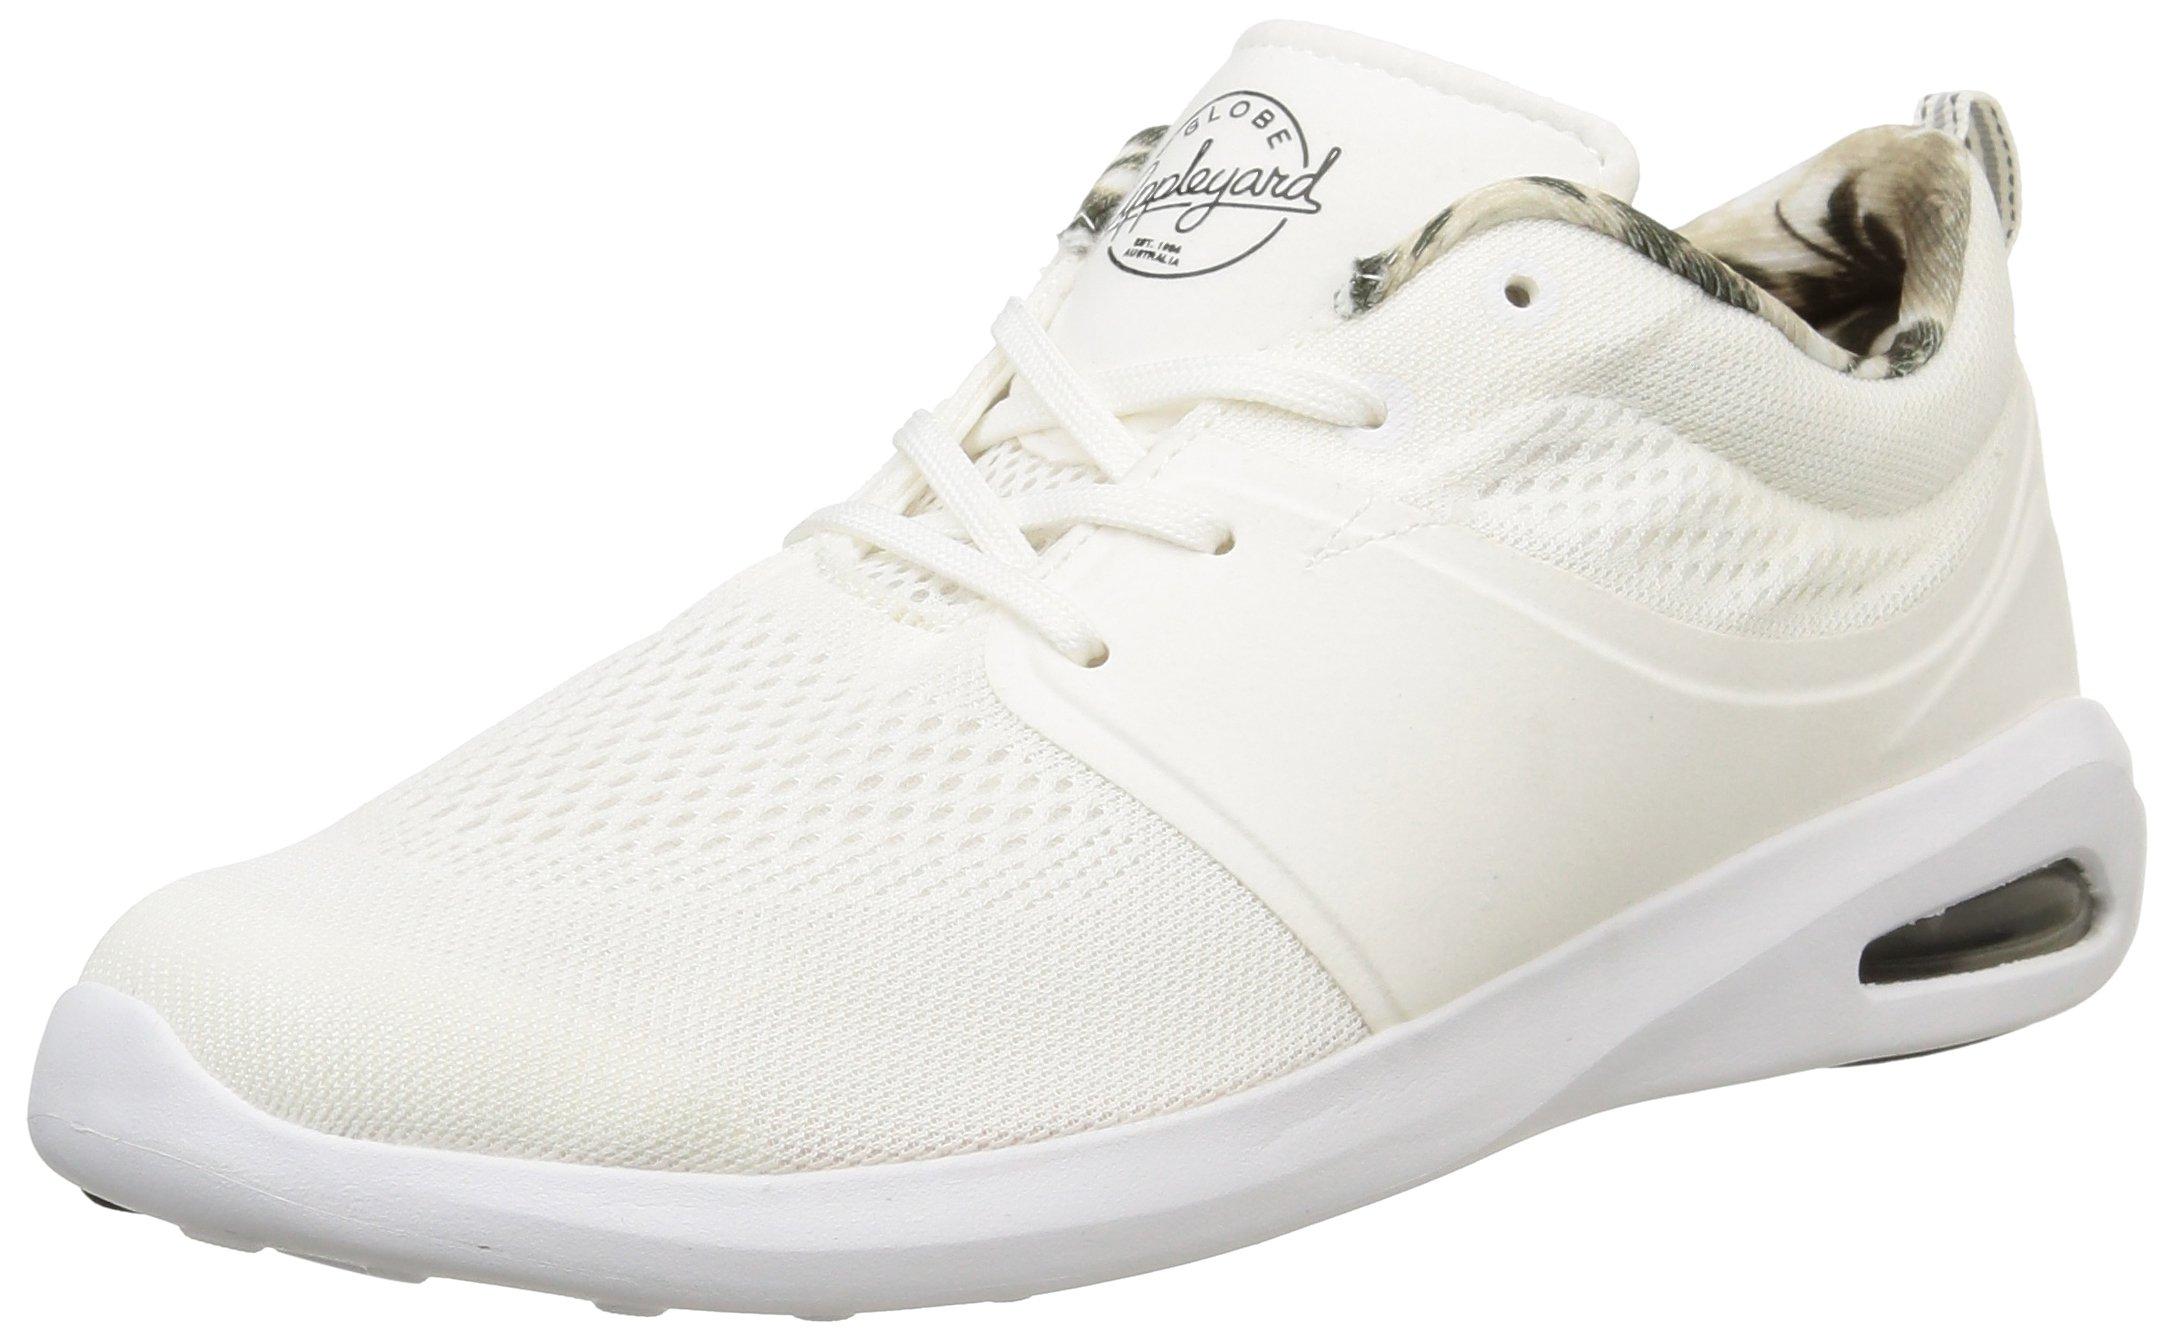 Globe Mahalo Lyte, Unisex-Erwachsene Sneakers, Weiß (11001 white), EU 47 (US 13